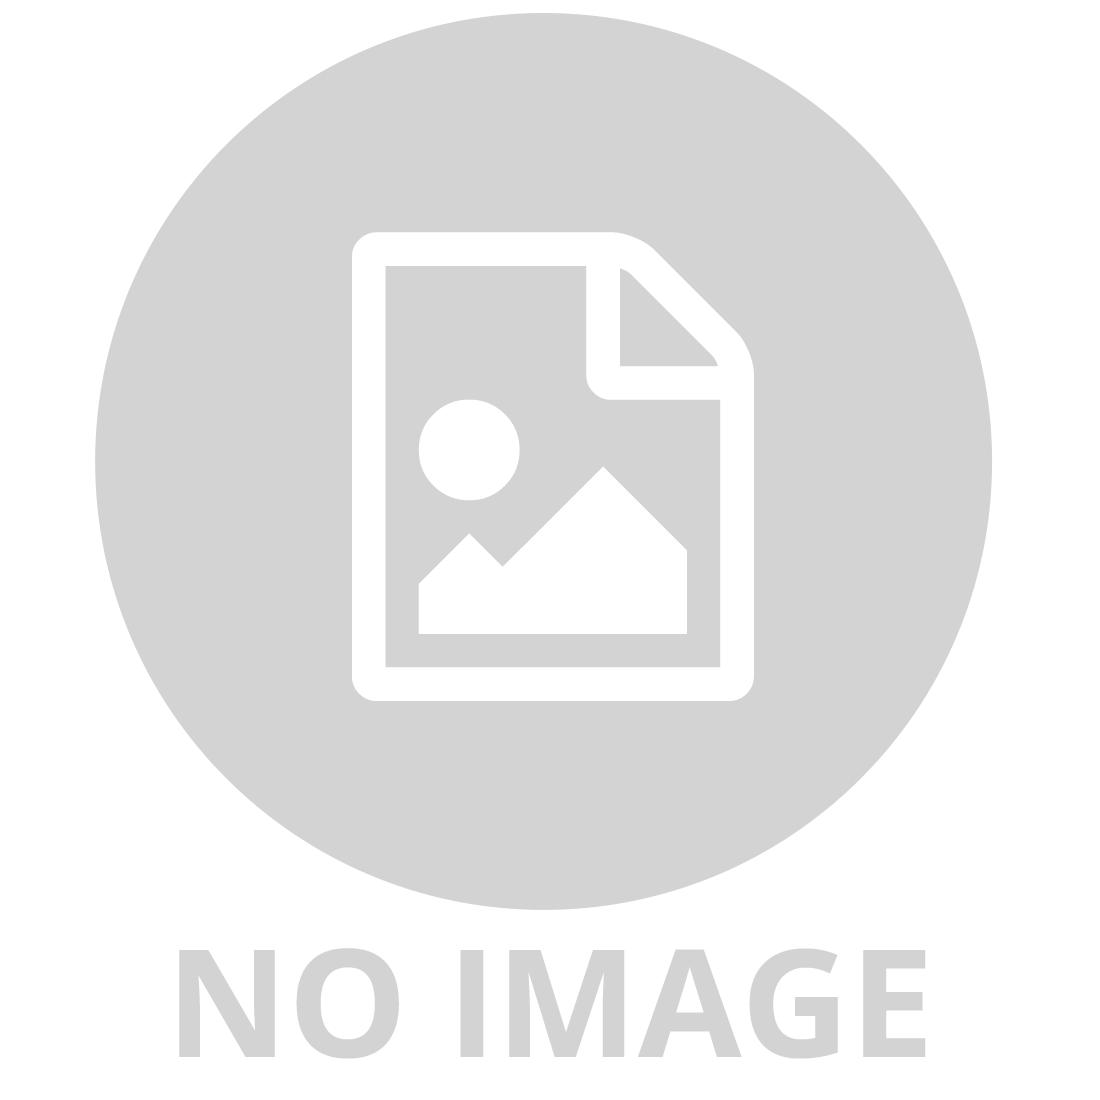 TIME FLIES! BOARD GAME